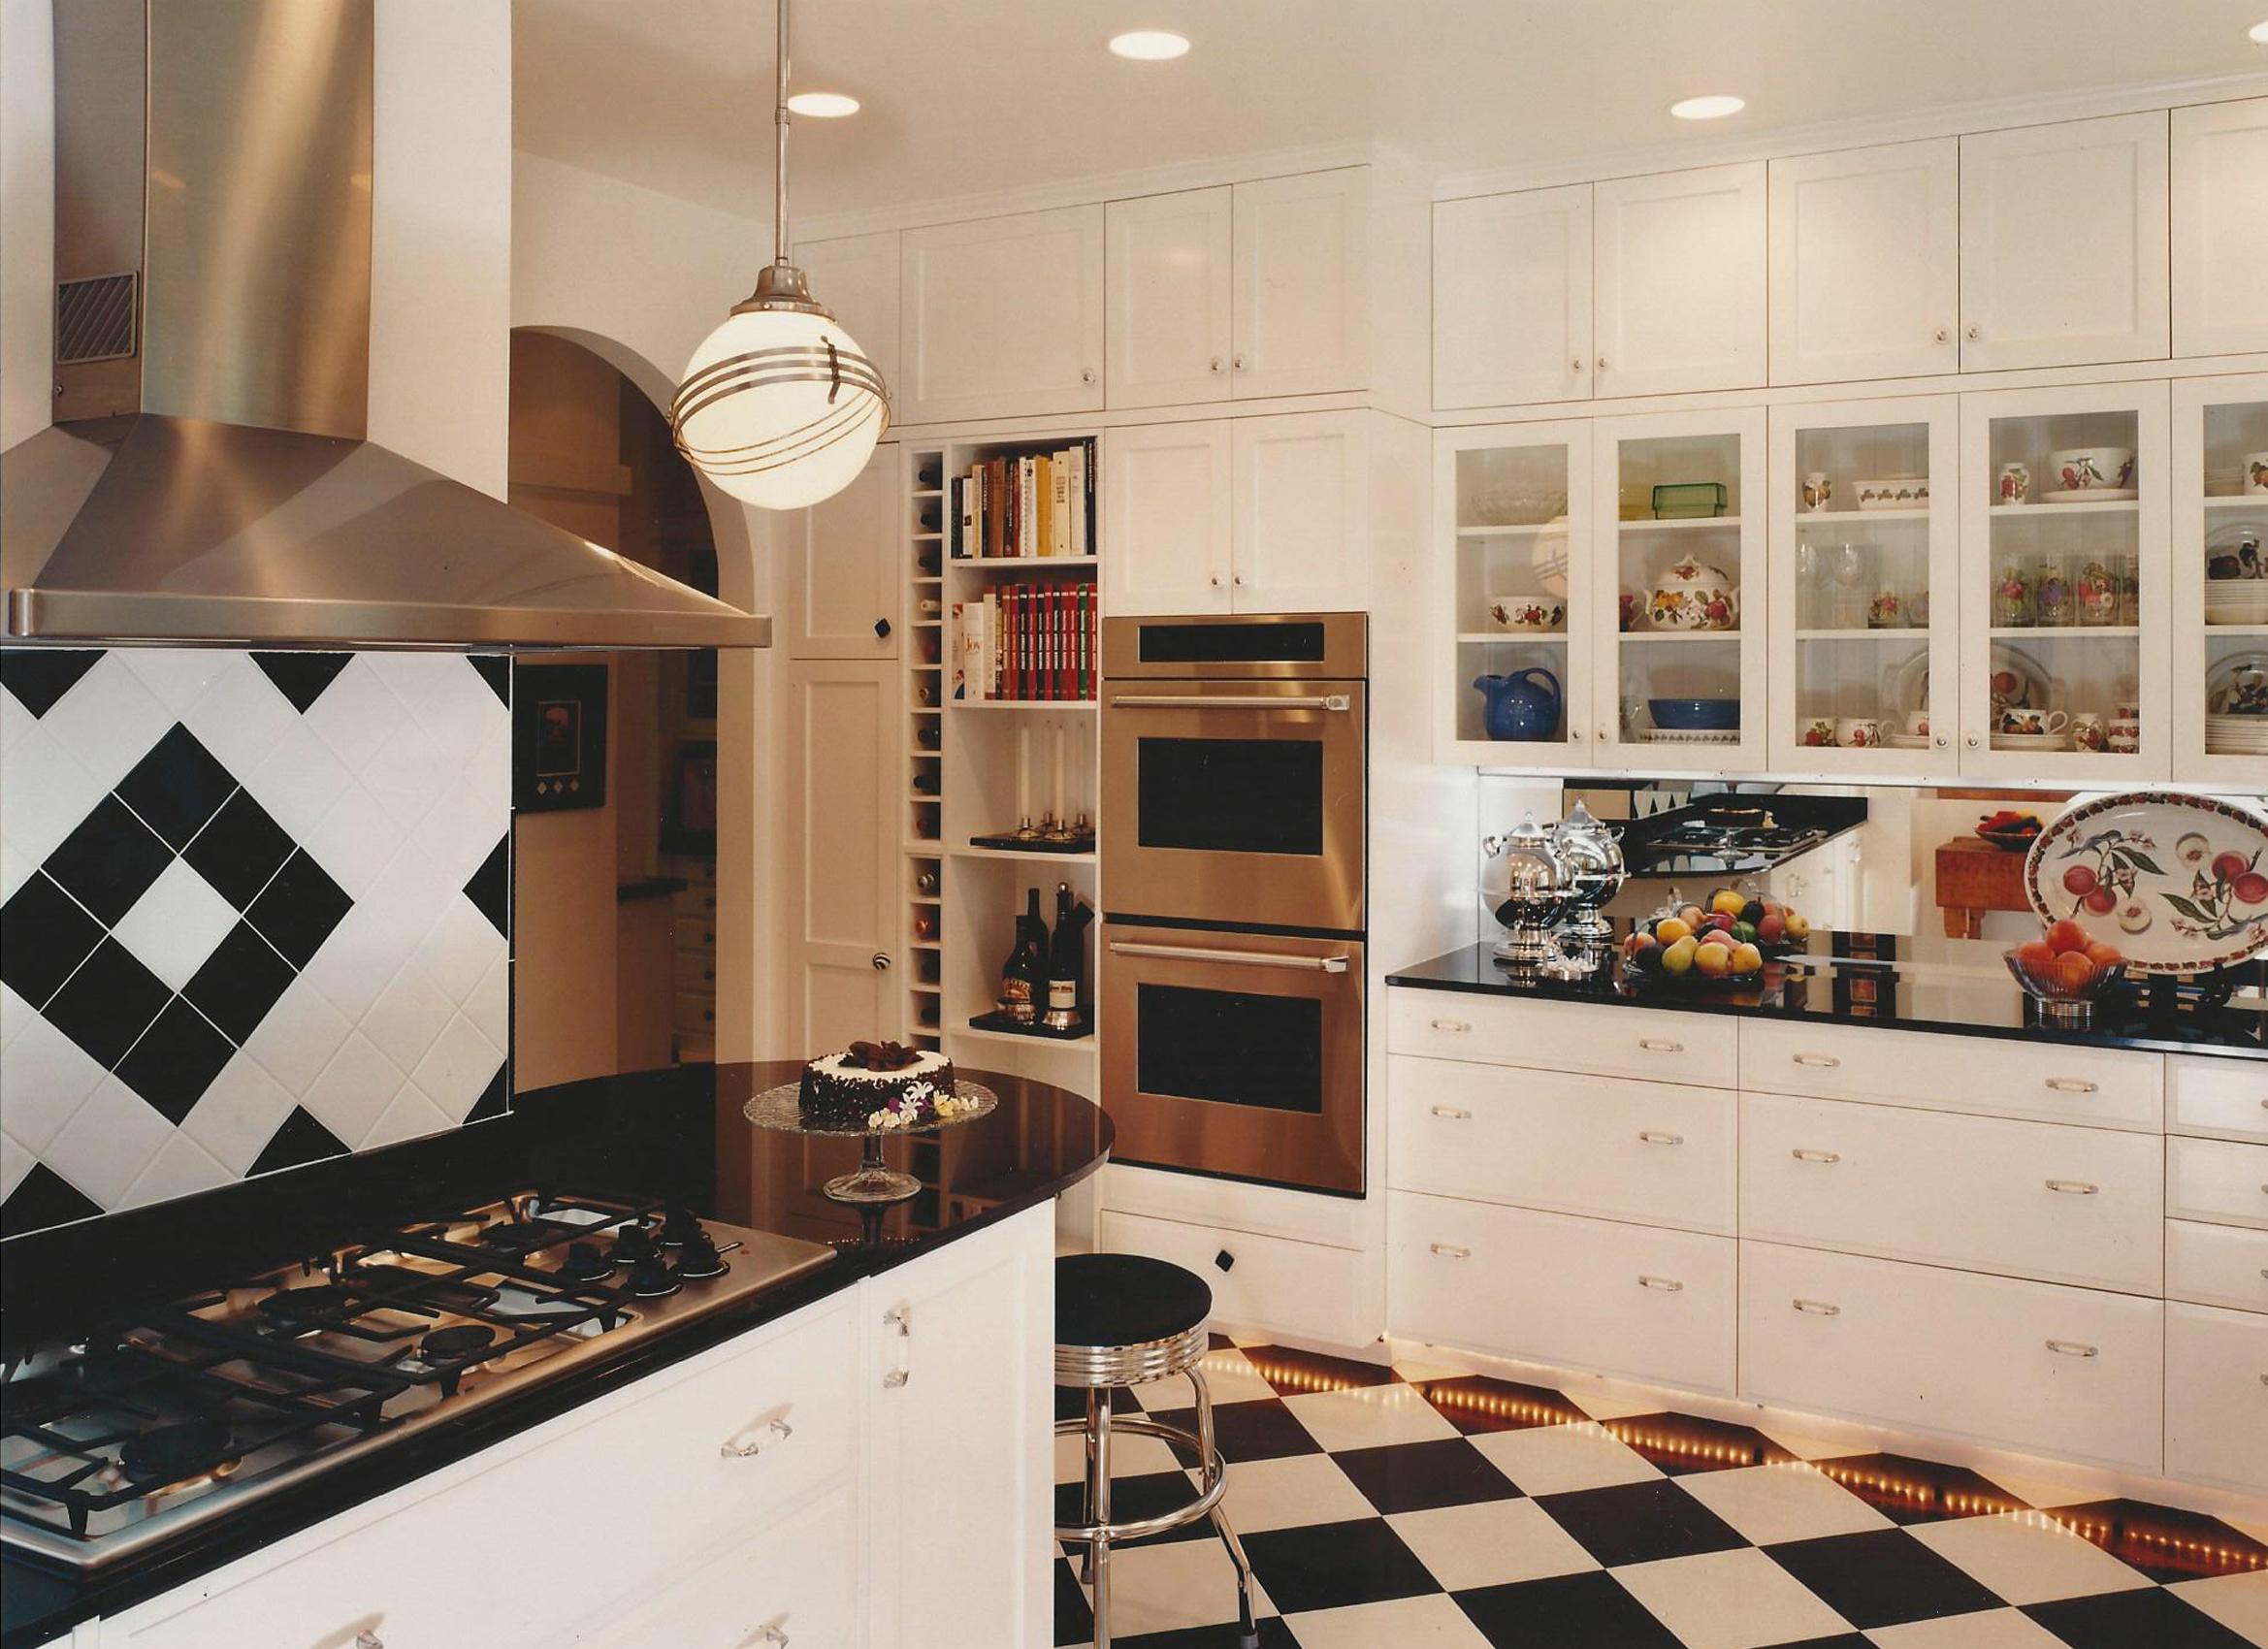 Art Deco Kitchens Of Kitchen Furniture Hardware Pulls Decorative Acnn Decor